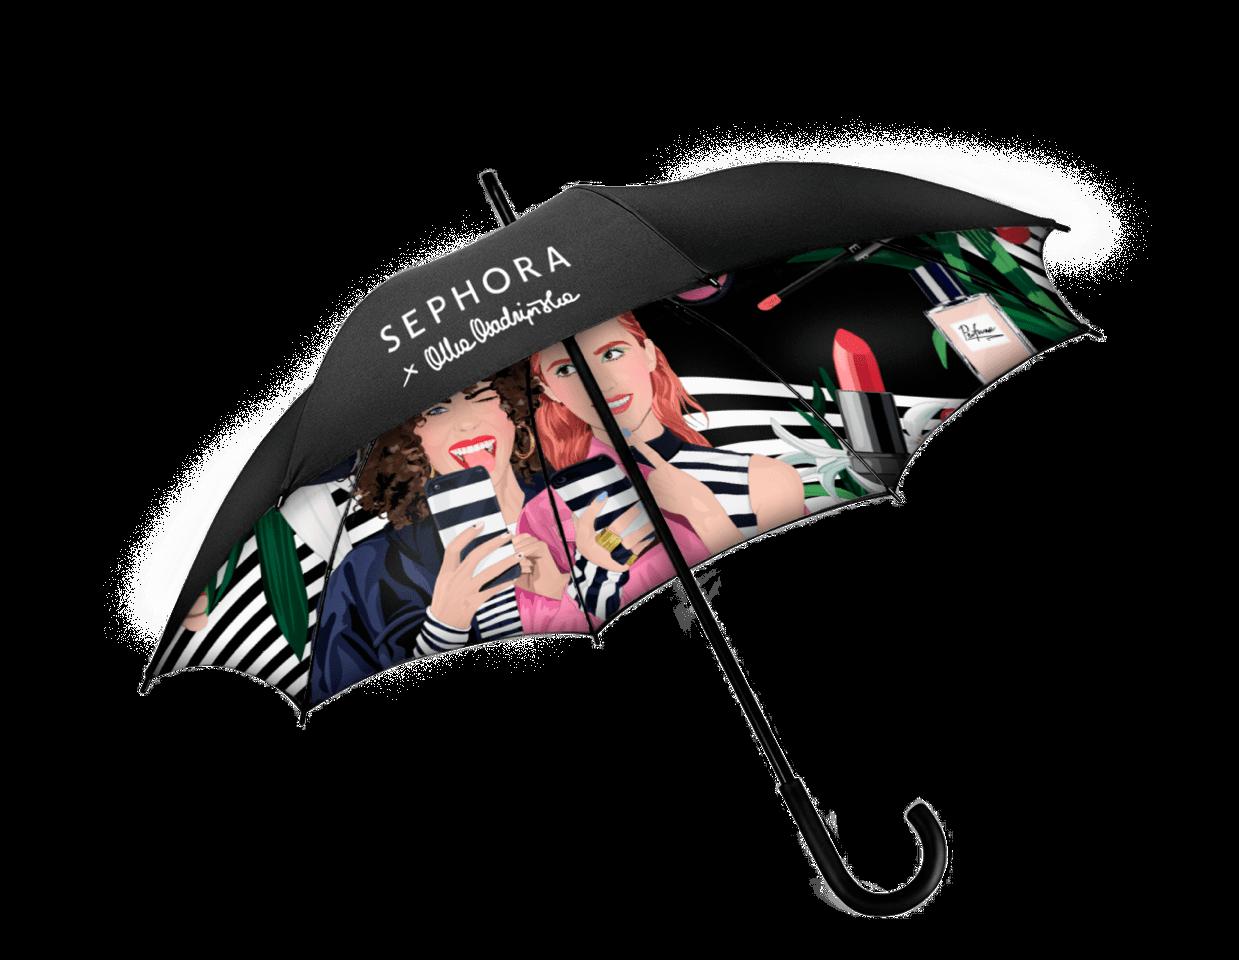 parasolka sephora